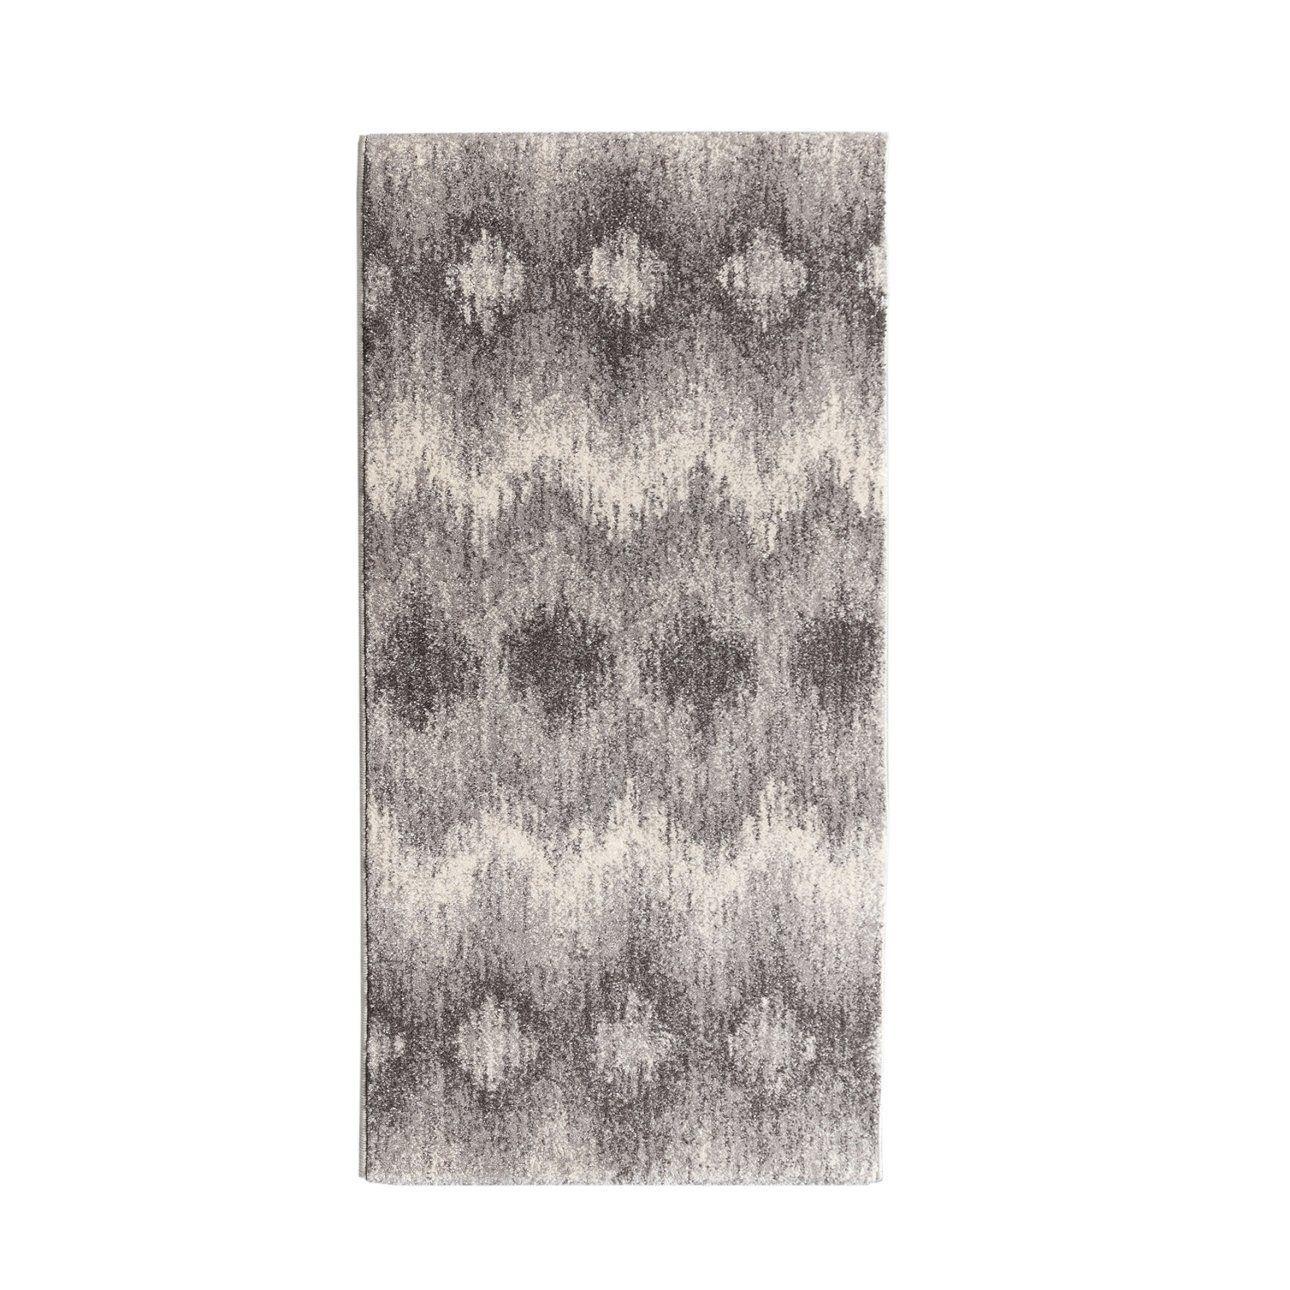 Teppich Hochflor 200 X 300 Teppich Berber Teppichboden